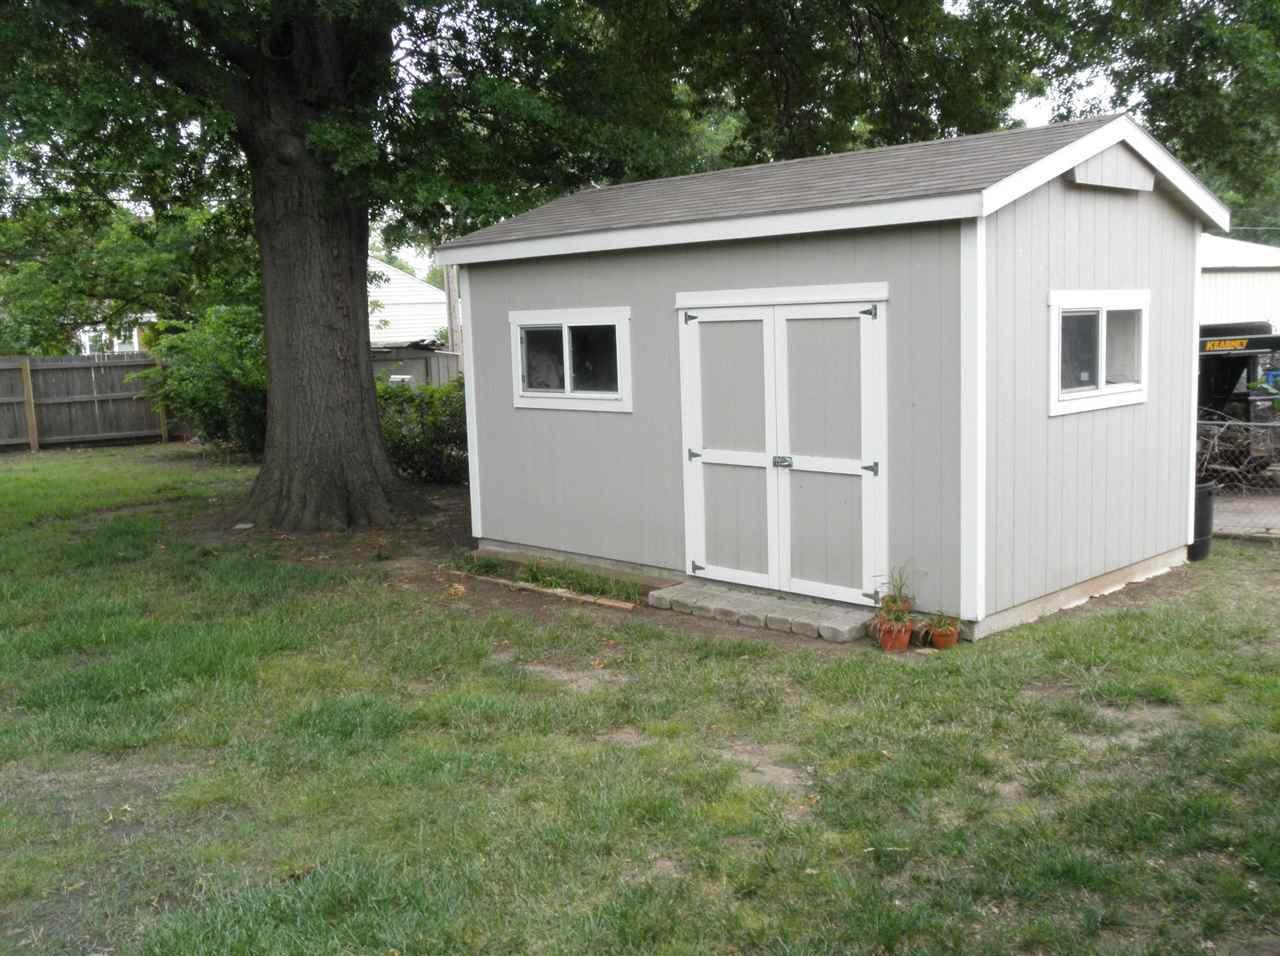 Sold Cross Sale W/ MLS | 127 Fairview  Ponca City, OK 74601 35